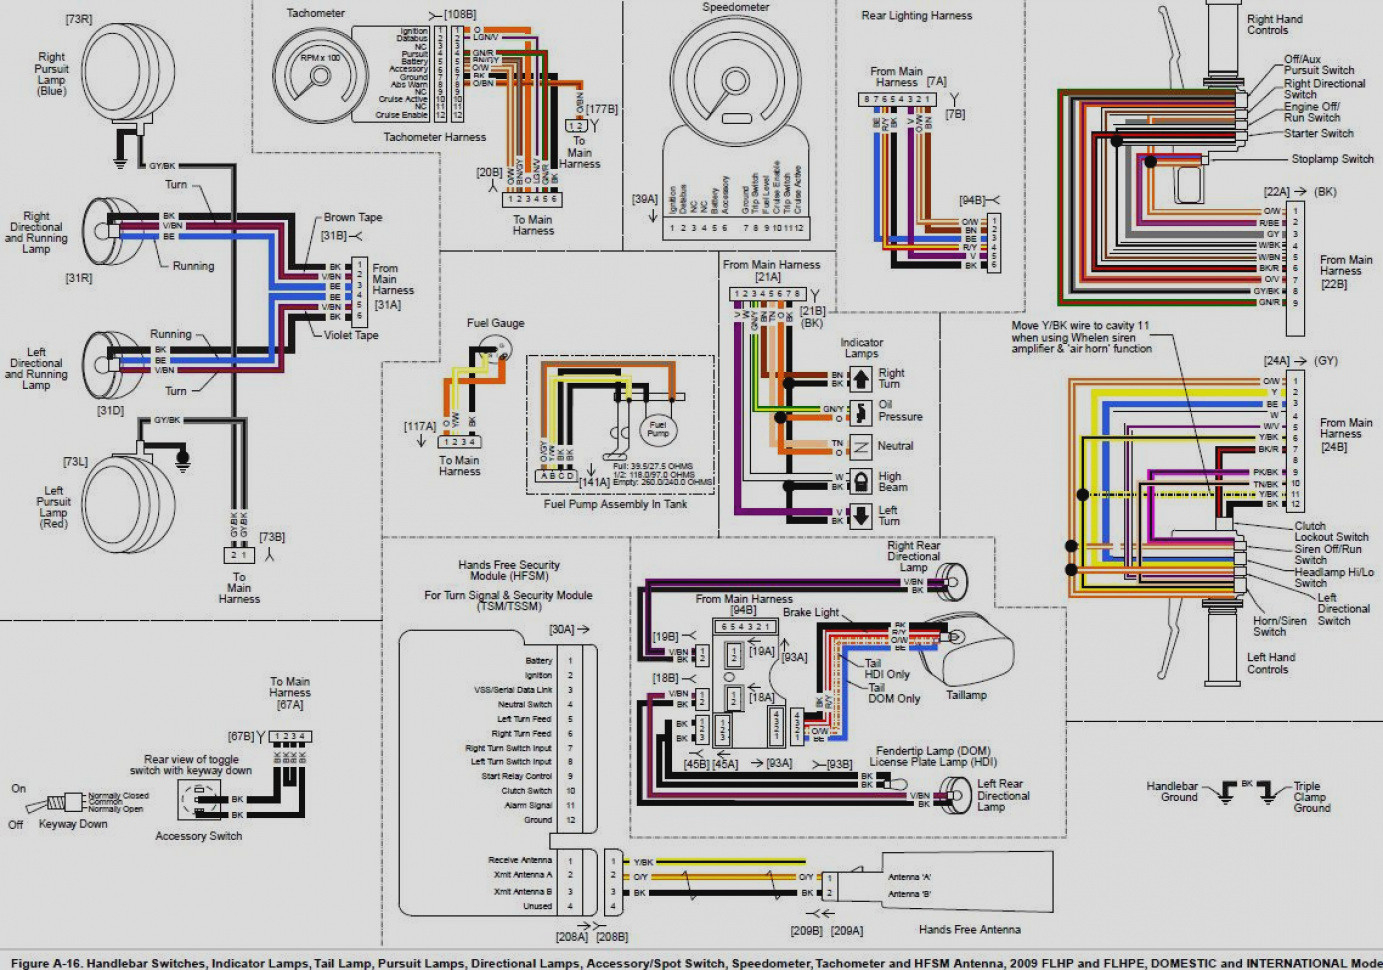 2006 Harley Davidson Wiring Diagram - Diagram 220 3 Pole 3 Wire for Wiring  Diagram SchematicsWiring Diagram Schematics